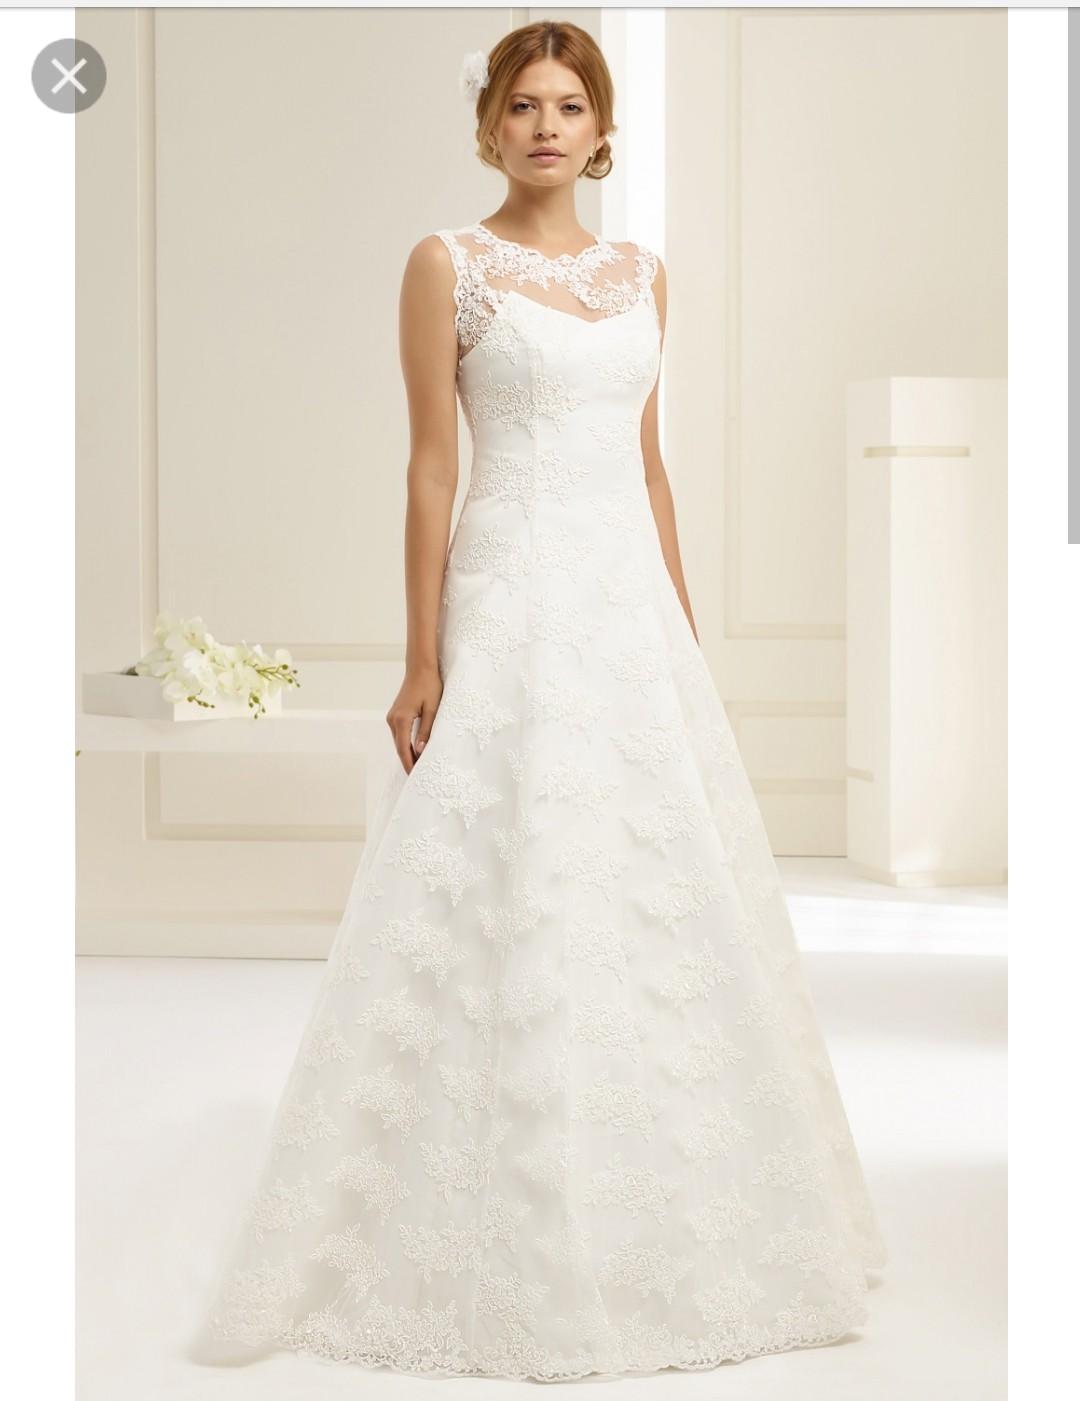 Bianco Evento - New Wedding Dresses - Stillwhite